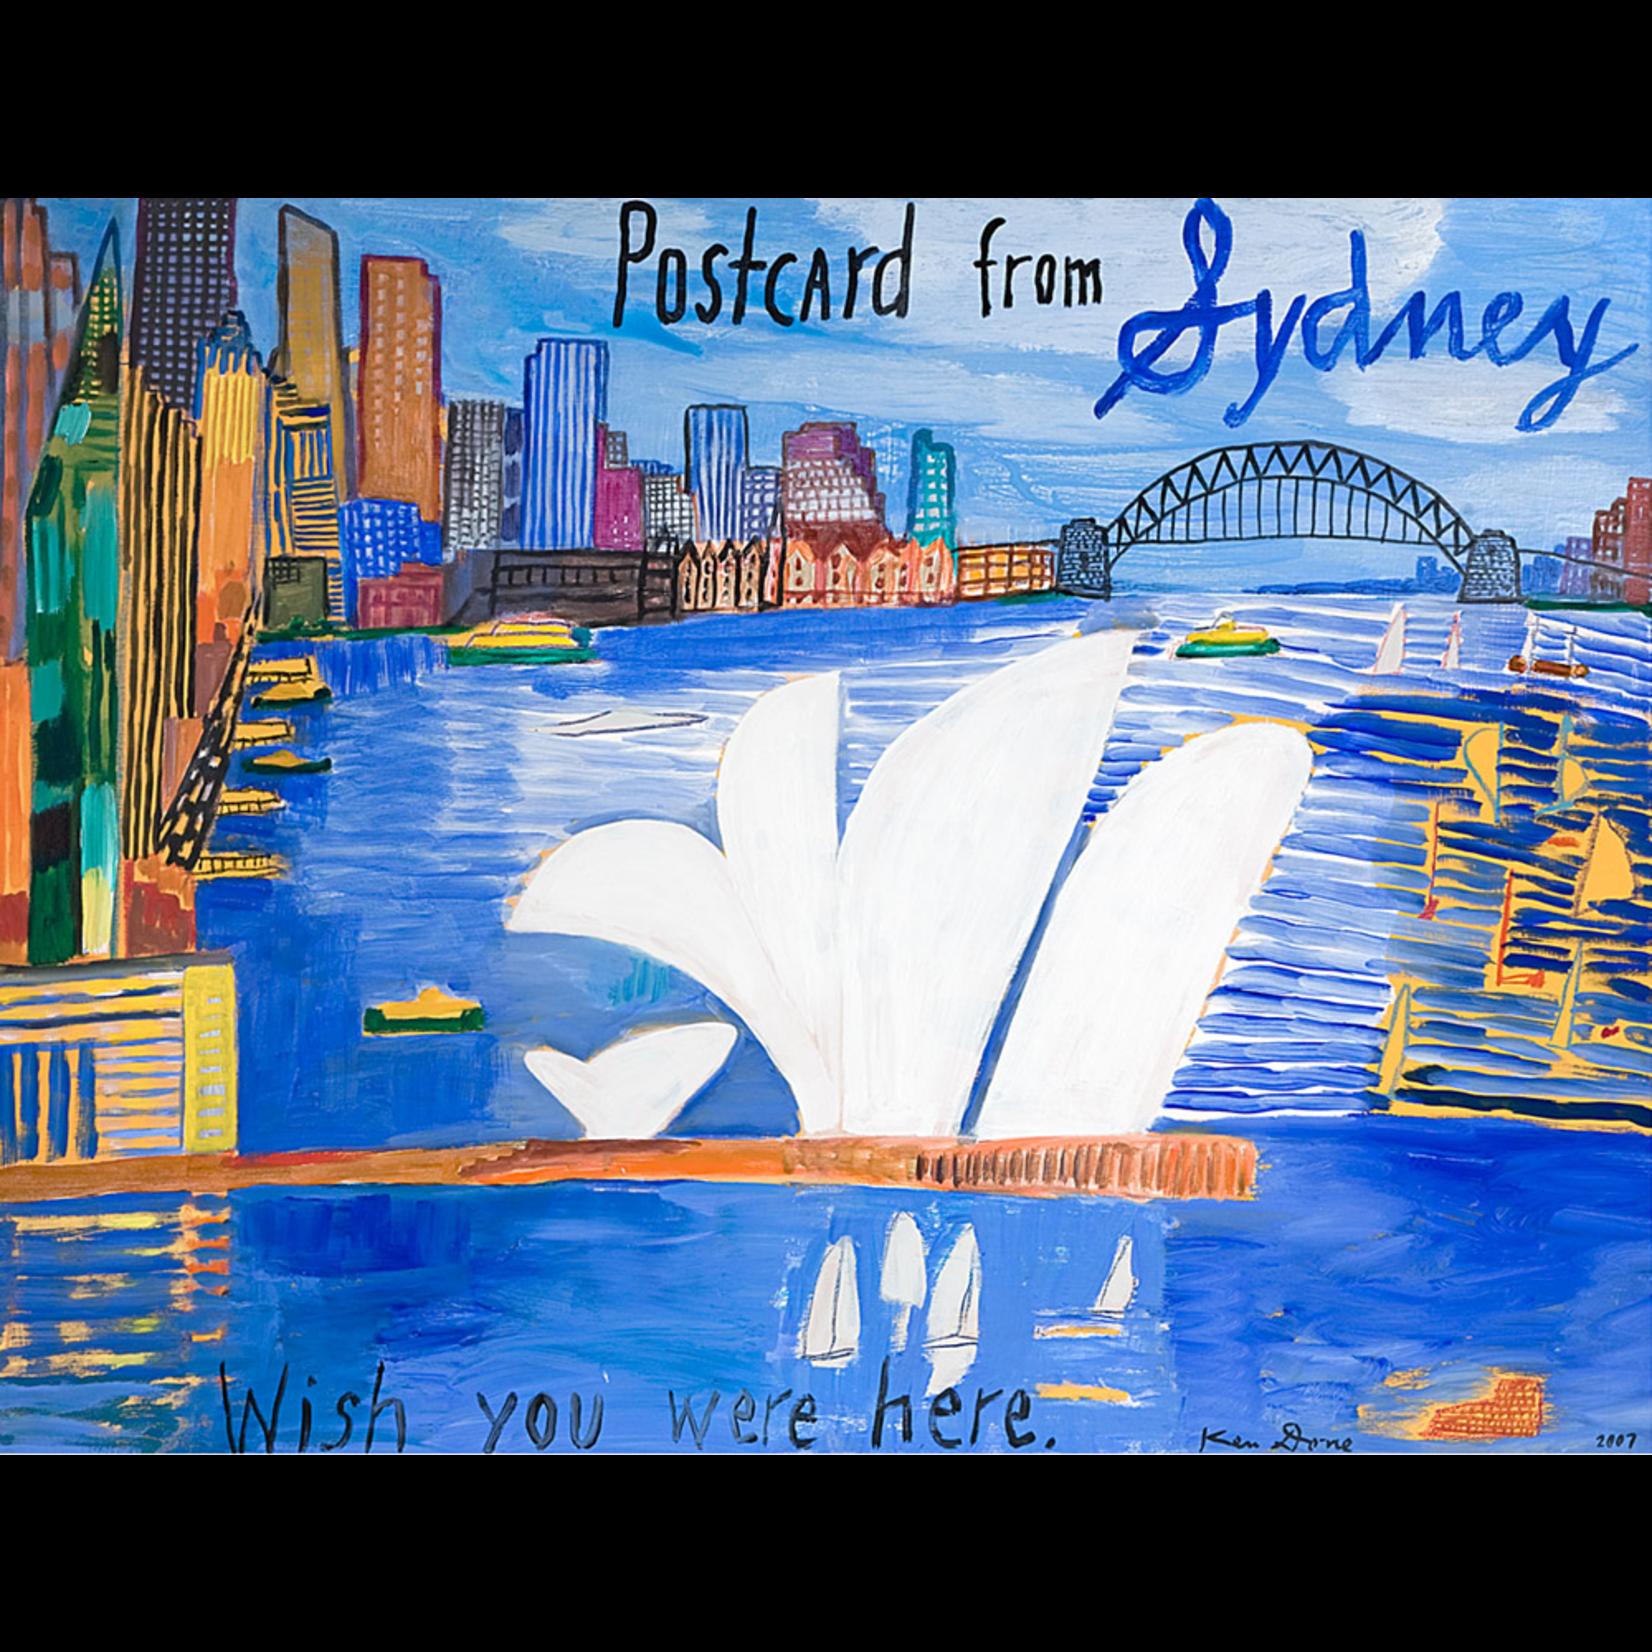 Limited Edition Prints Postcard, June 2007